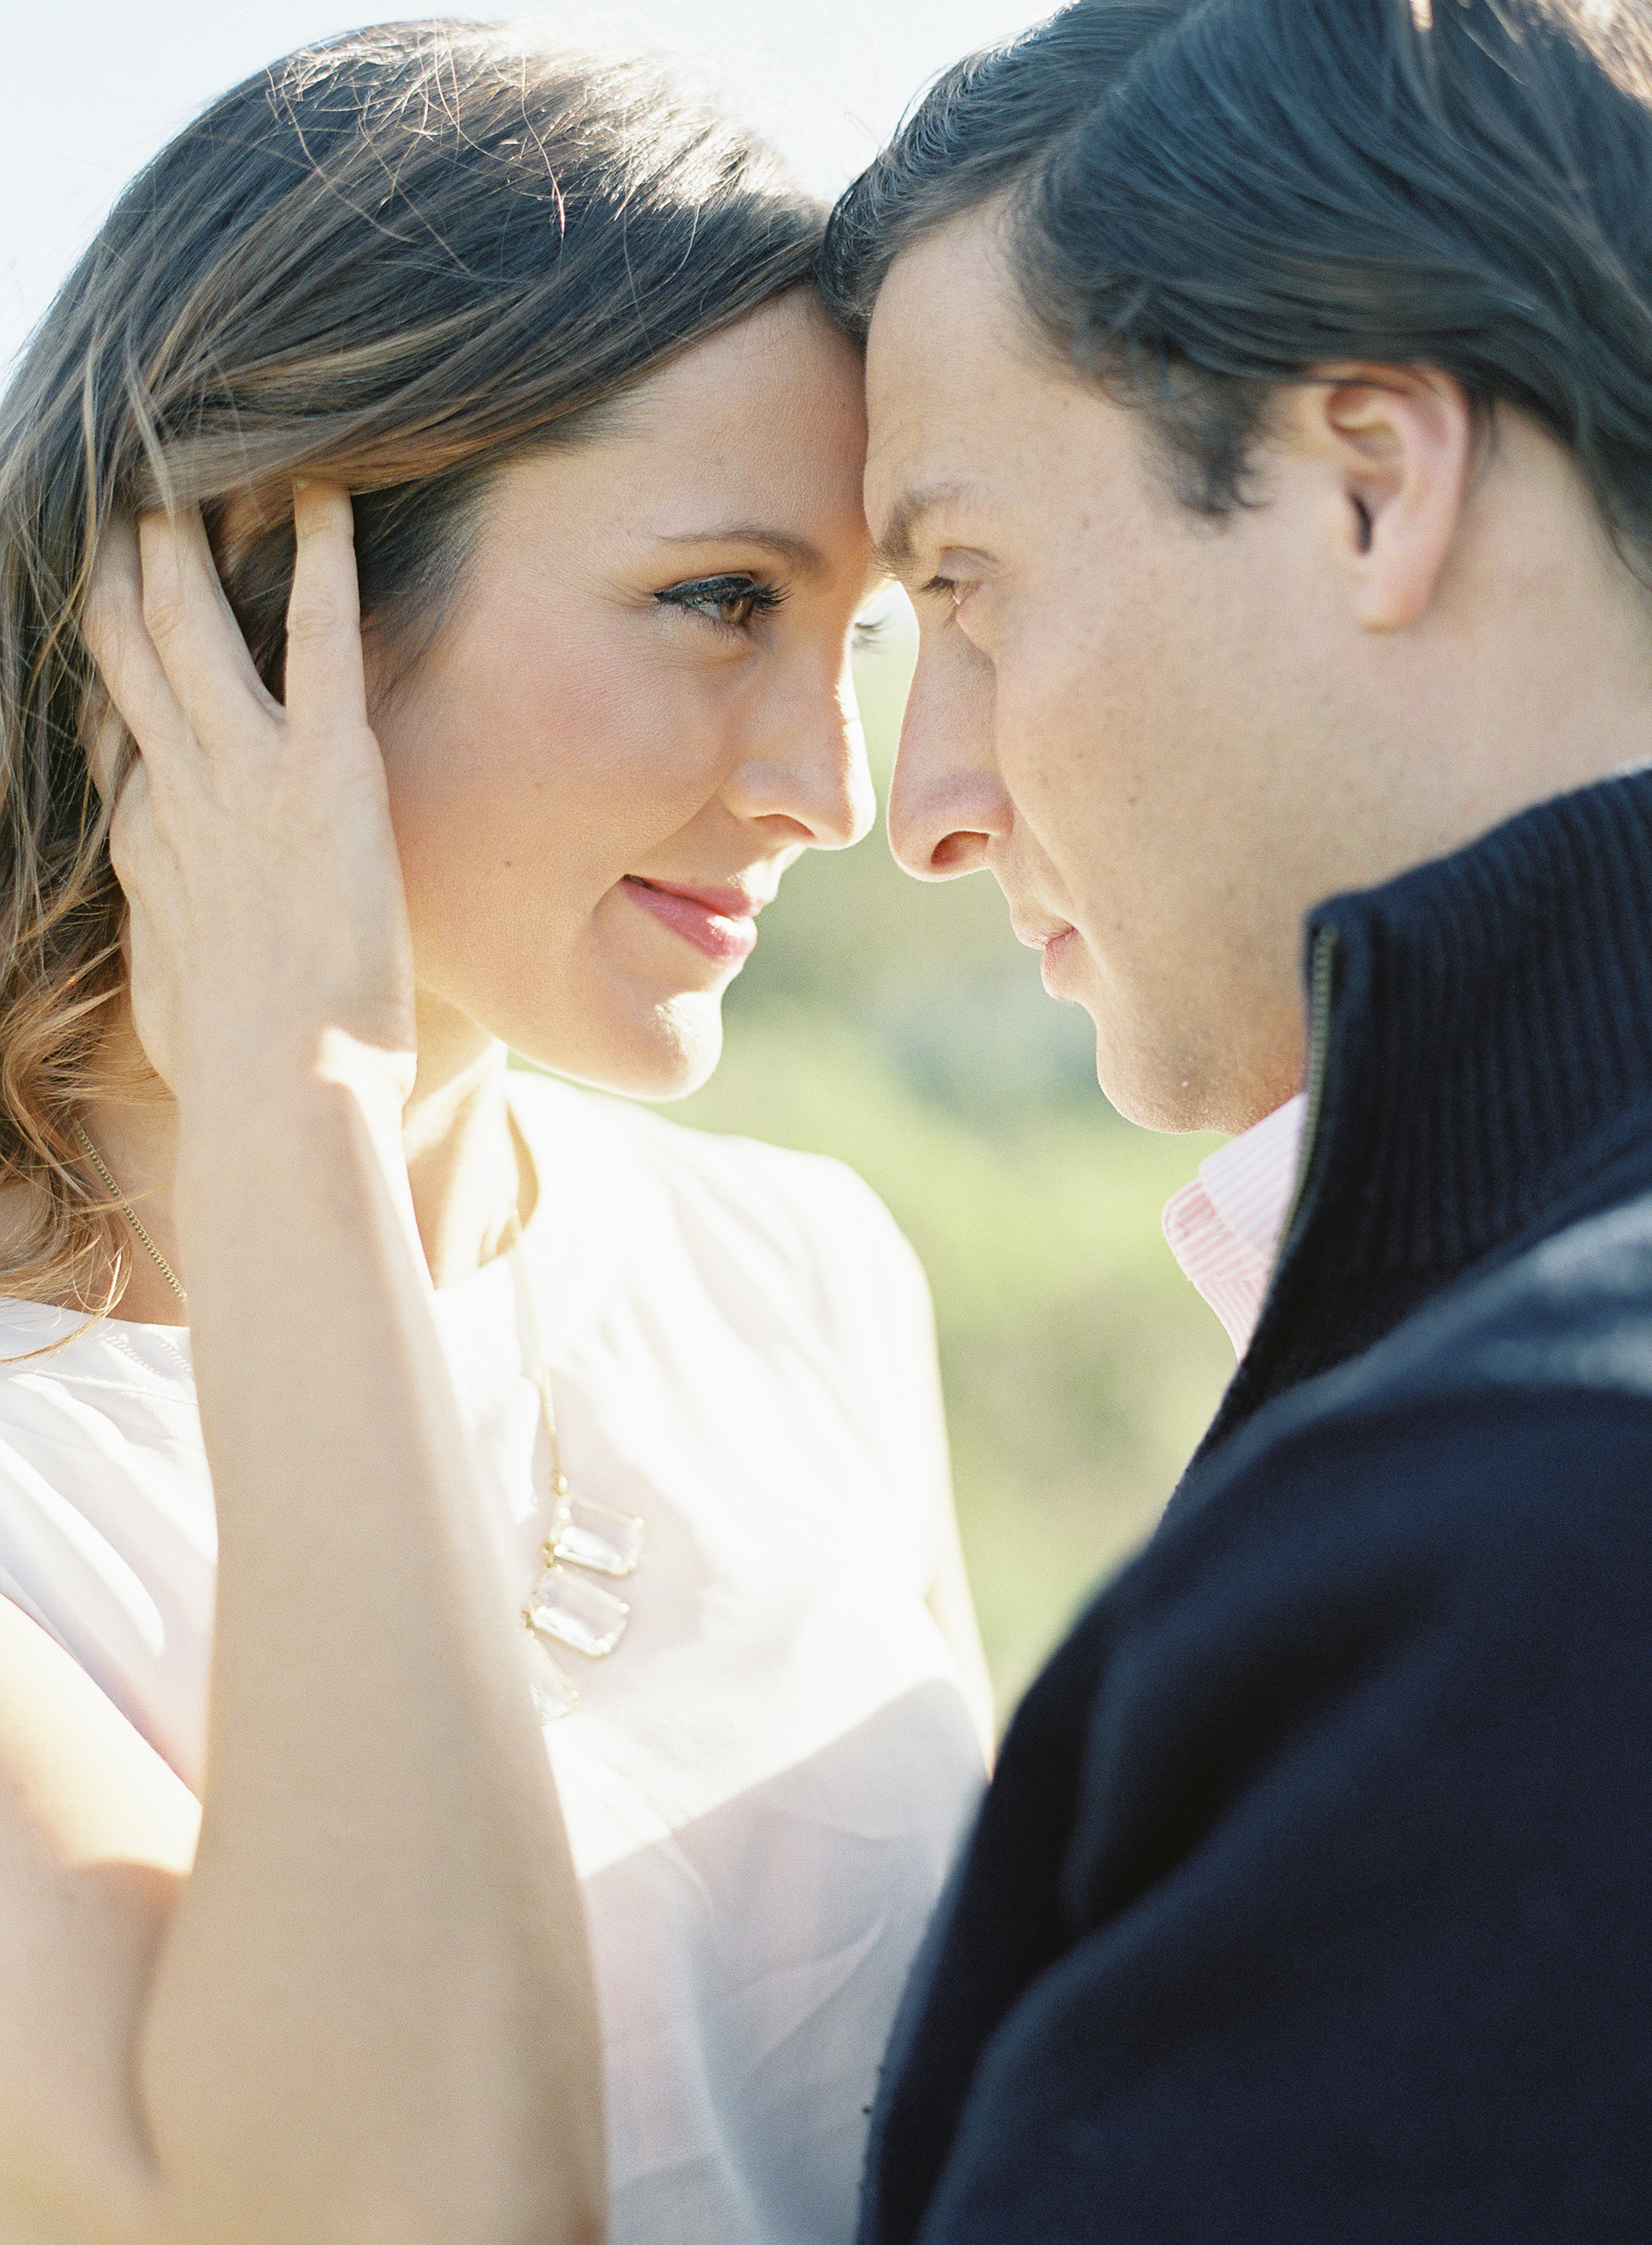 Meghan Mehan Photography - Fine Art Film Wedding Photography - San Francisco   Napa   Sonoma   Big Sur   Chicago   Minneapolis   Milwaukee   Lake Geneva   Door County   Wisconsin 022.jpg